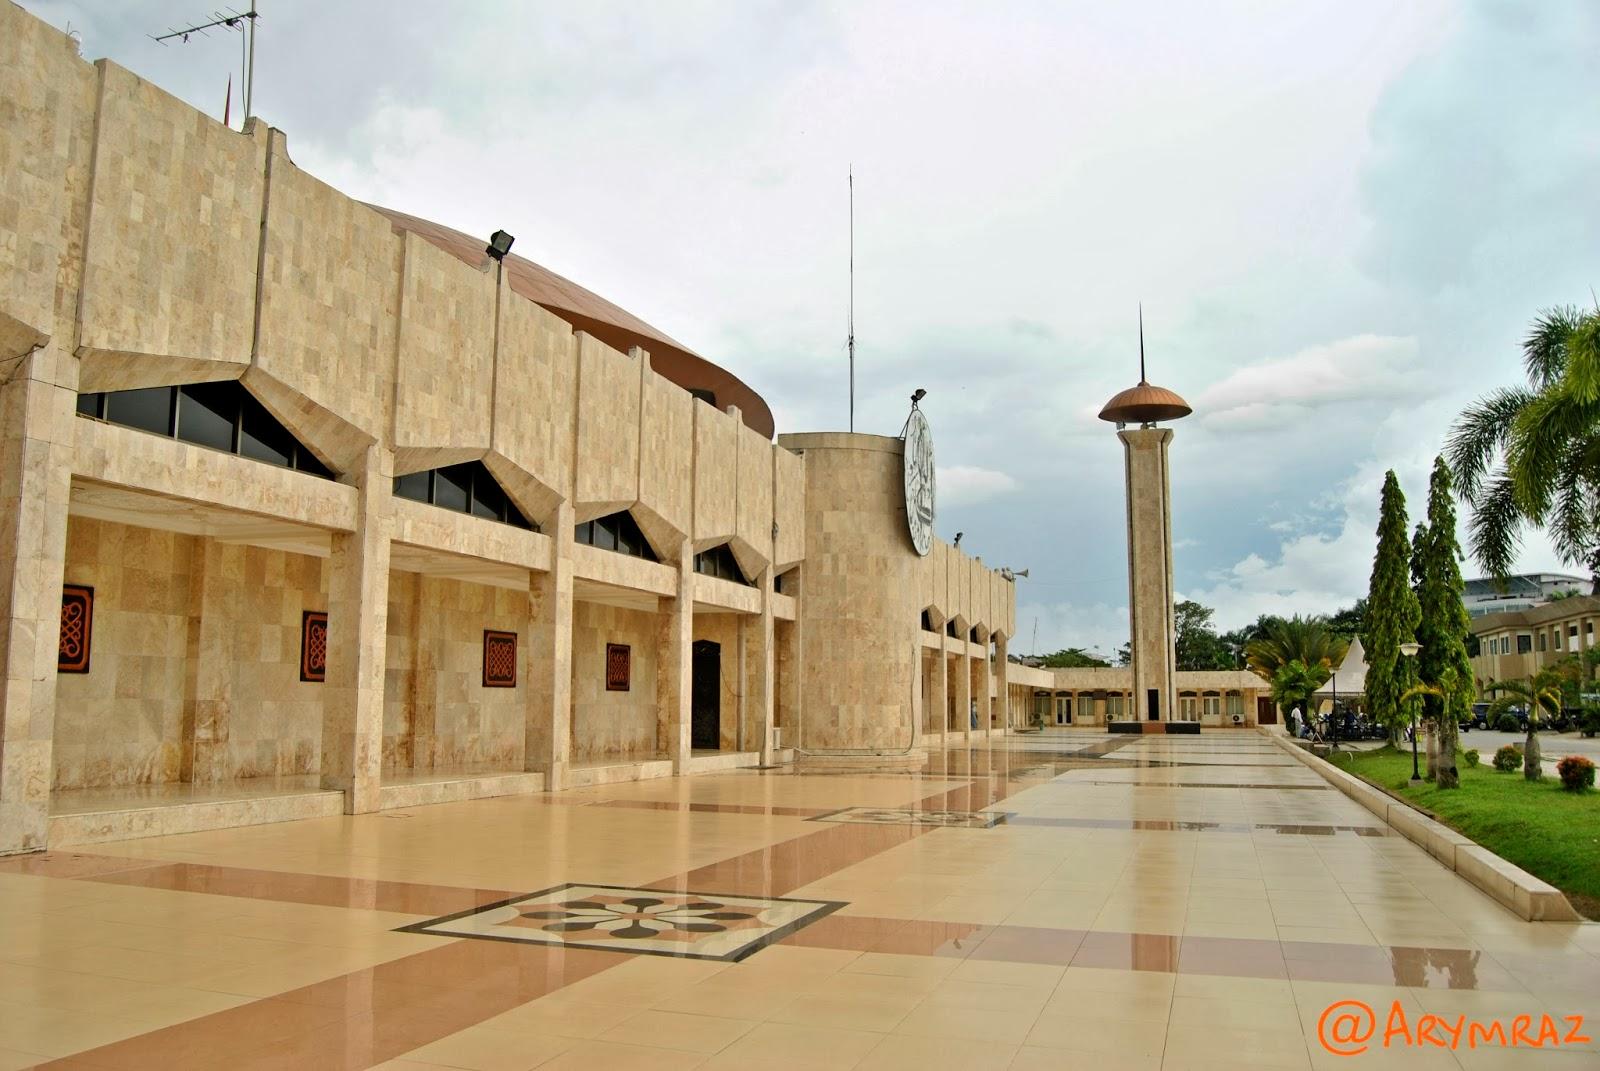 Ary Wardhana Yusuf Jejakku Mesjid Raya Sabilal Muhtadin 06 Masjid